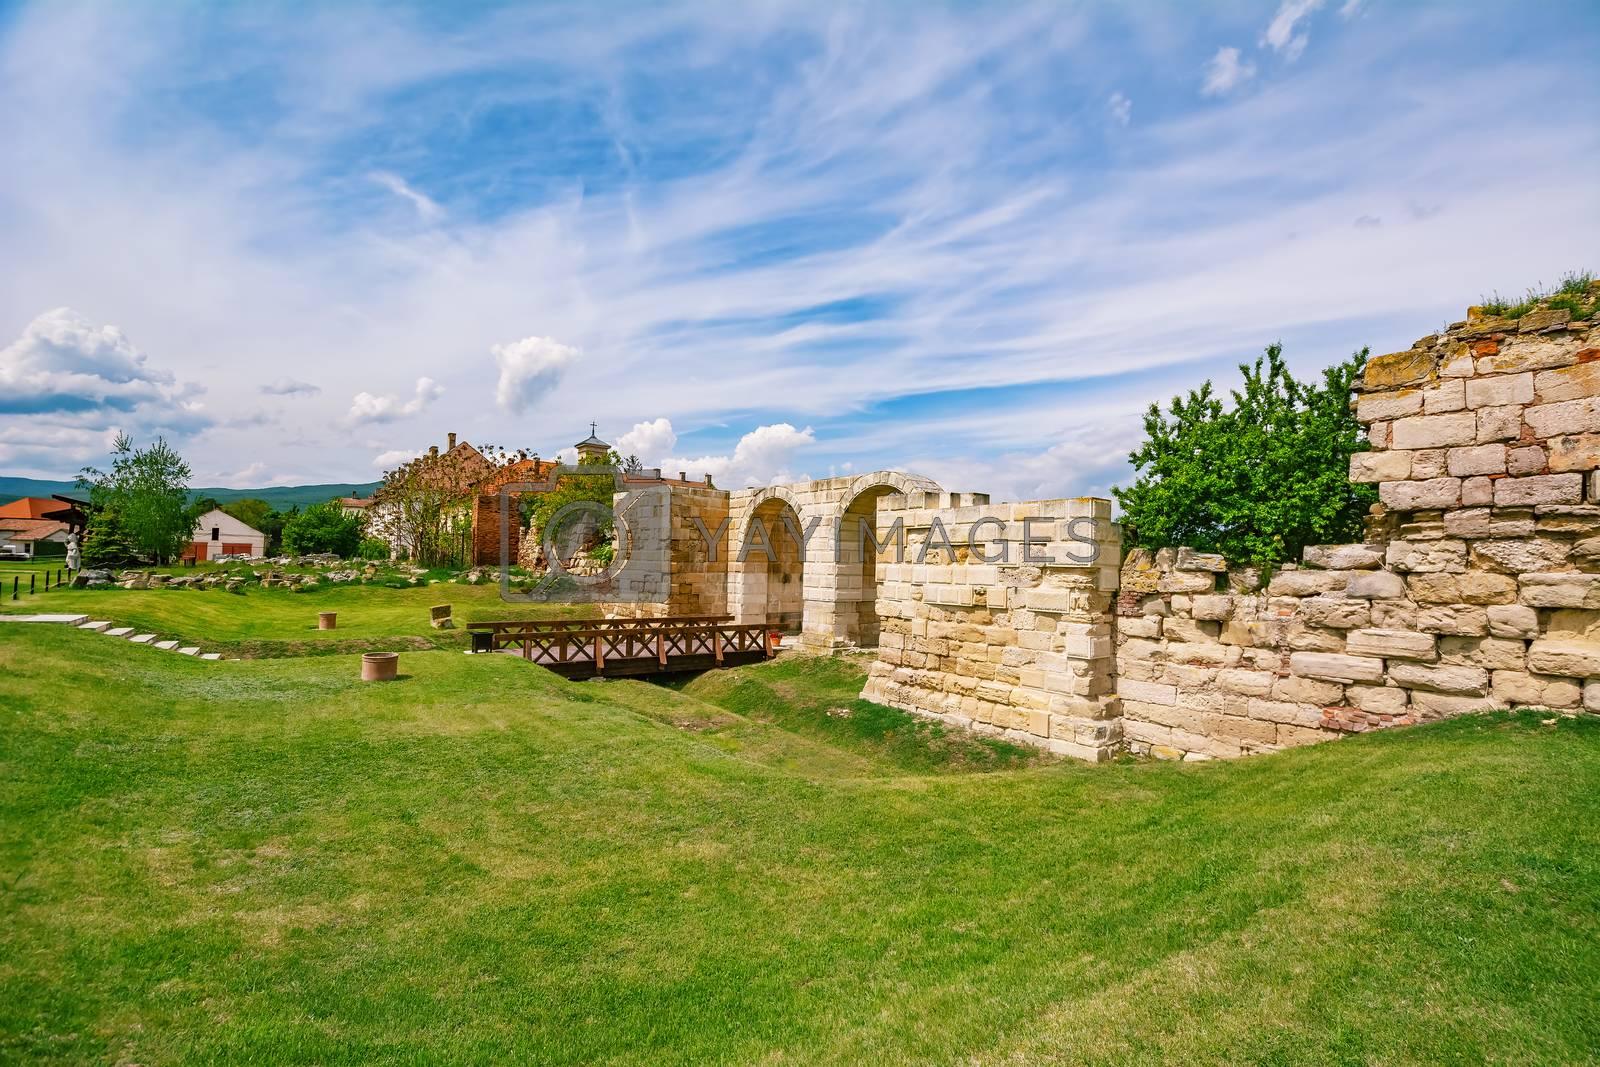 Ruins of an Old Fortress Wall of Alba Carolina Citadel, Alba Iulia, Romania